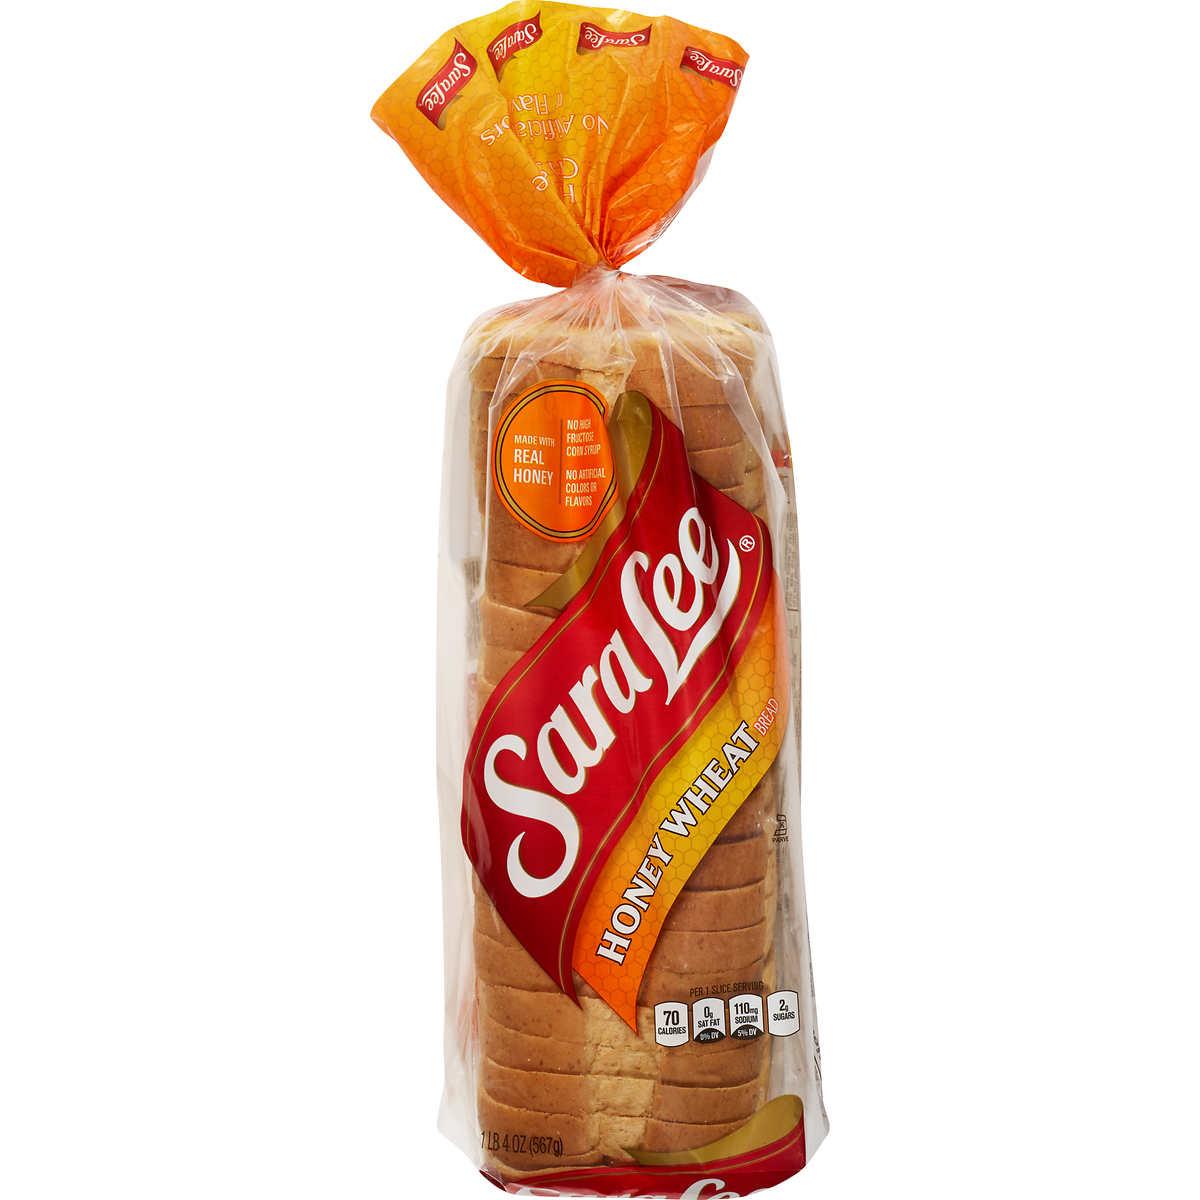 Sara Lee Honey Wheat Bread, 20 oz loaf